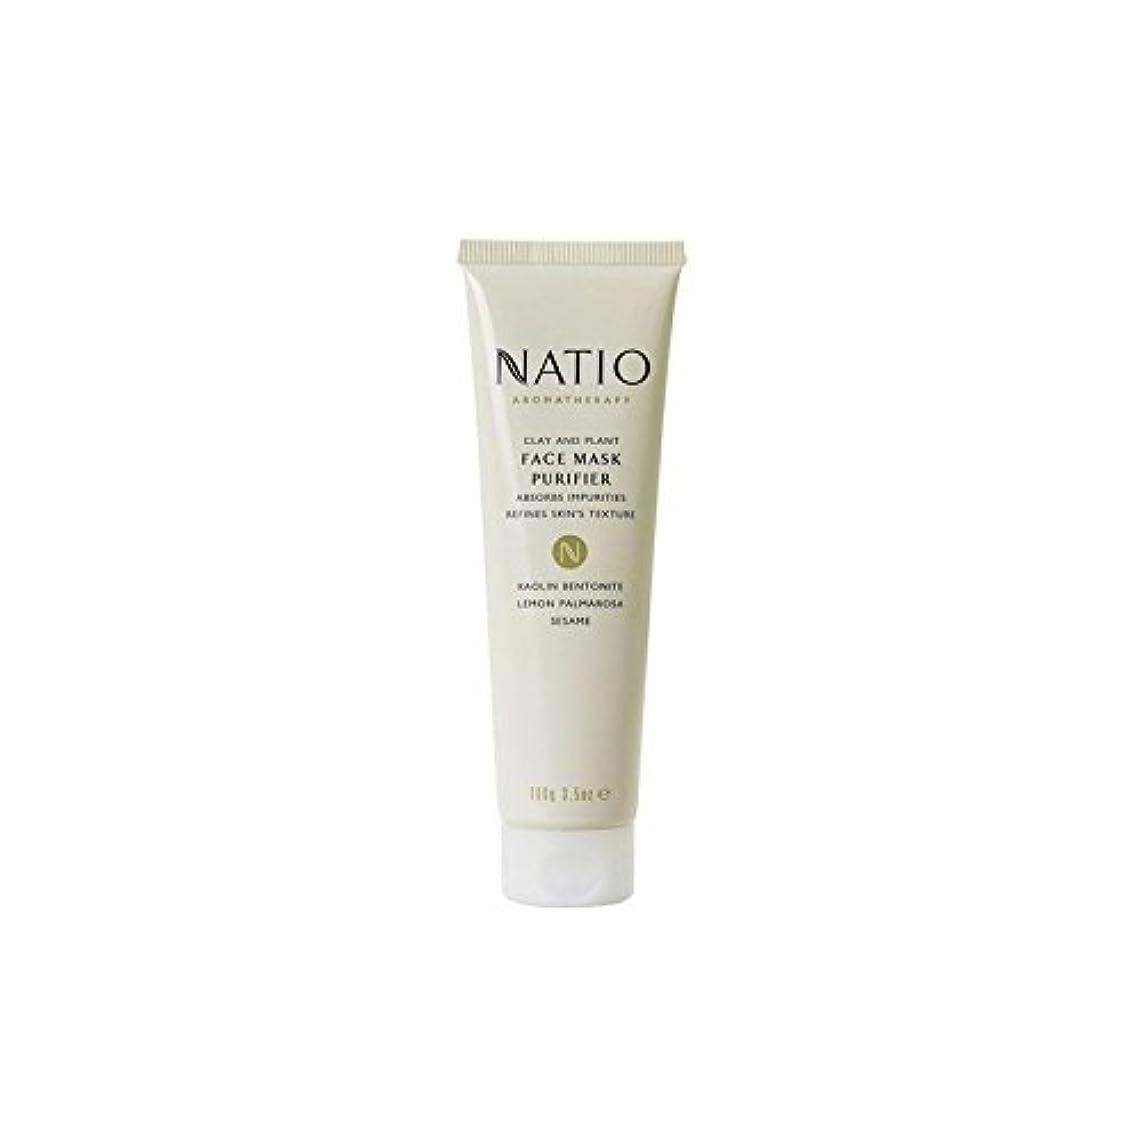 Natio Clay & Plant Face Mask Purifier (100G) - 粘土&植物フェイスマスクの浄化(100グラム) [並行輸入品]